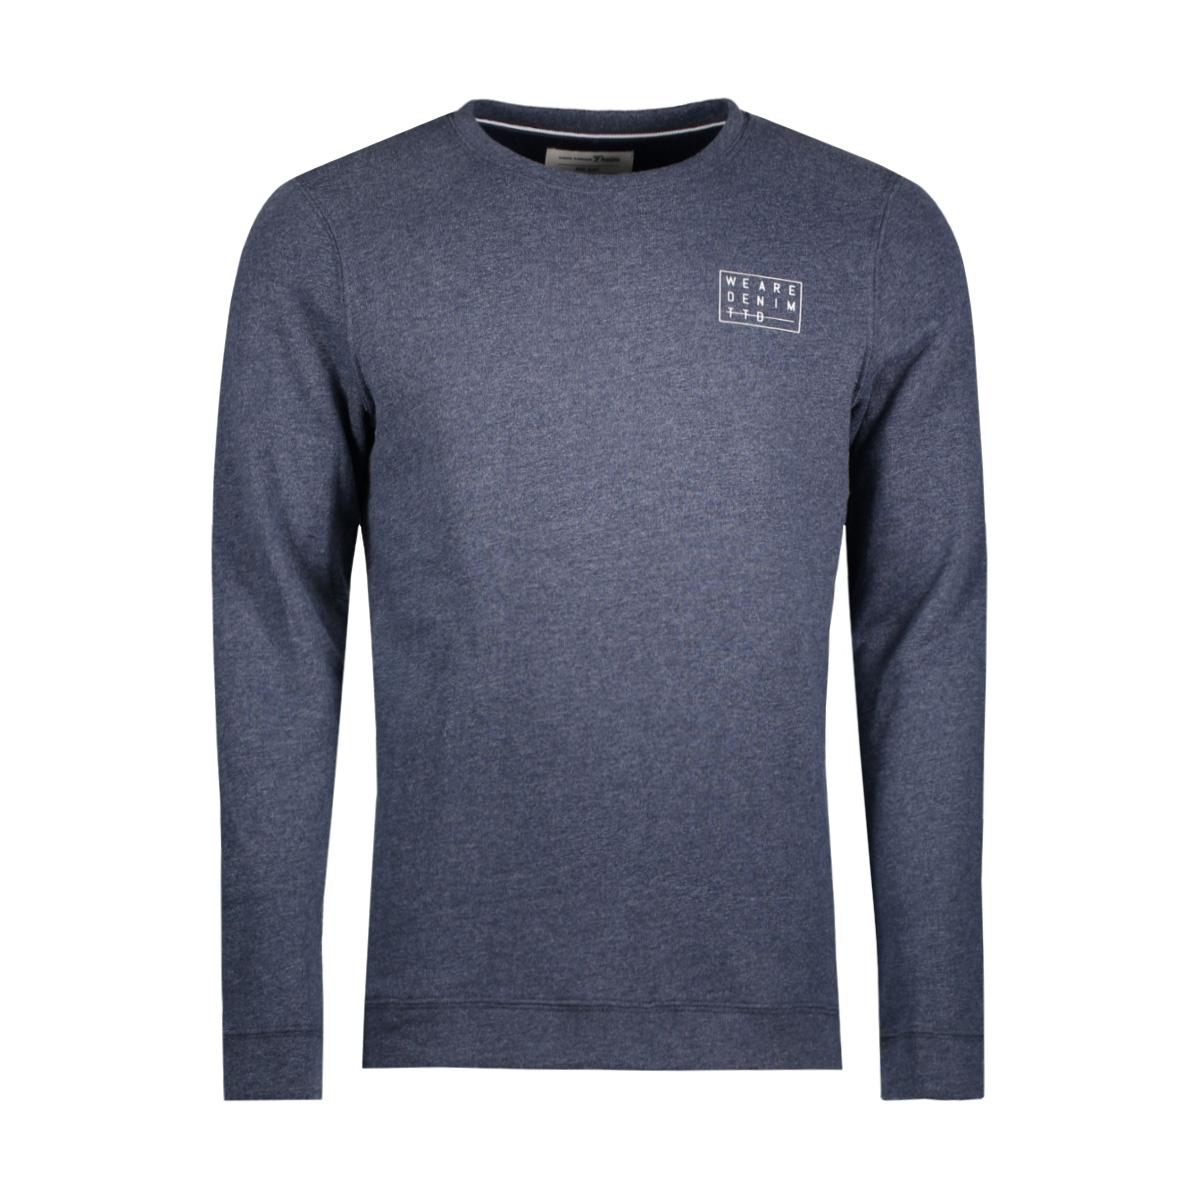 2555116.00.12 tom tailor sweater 6740